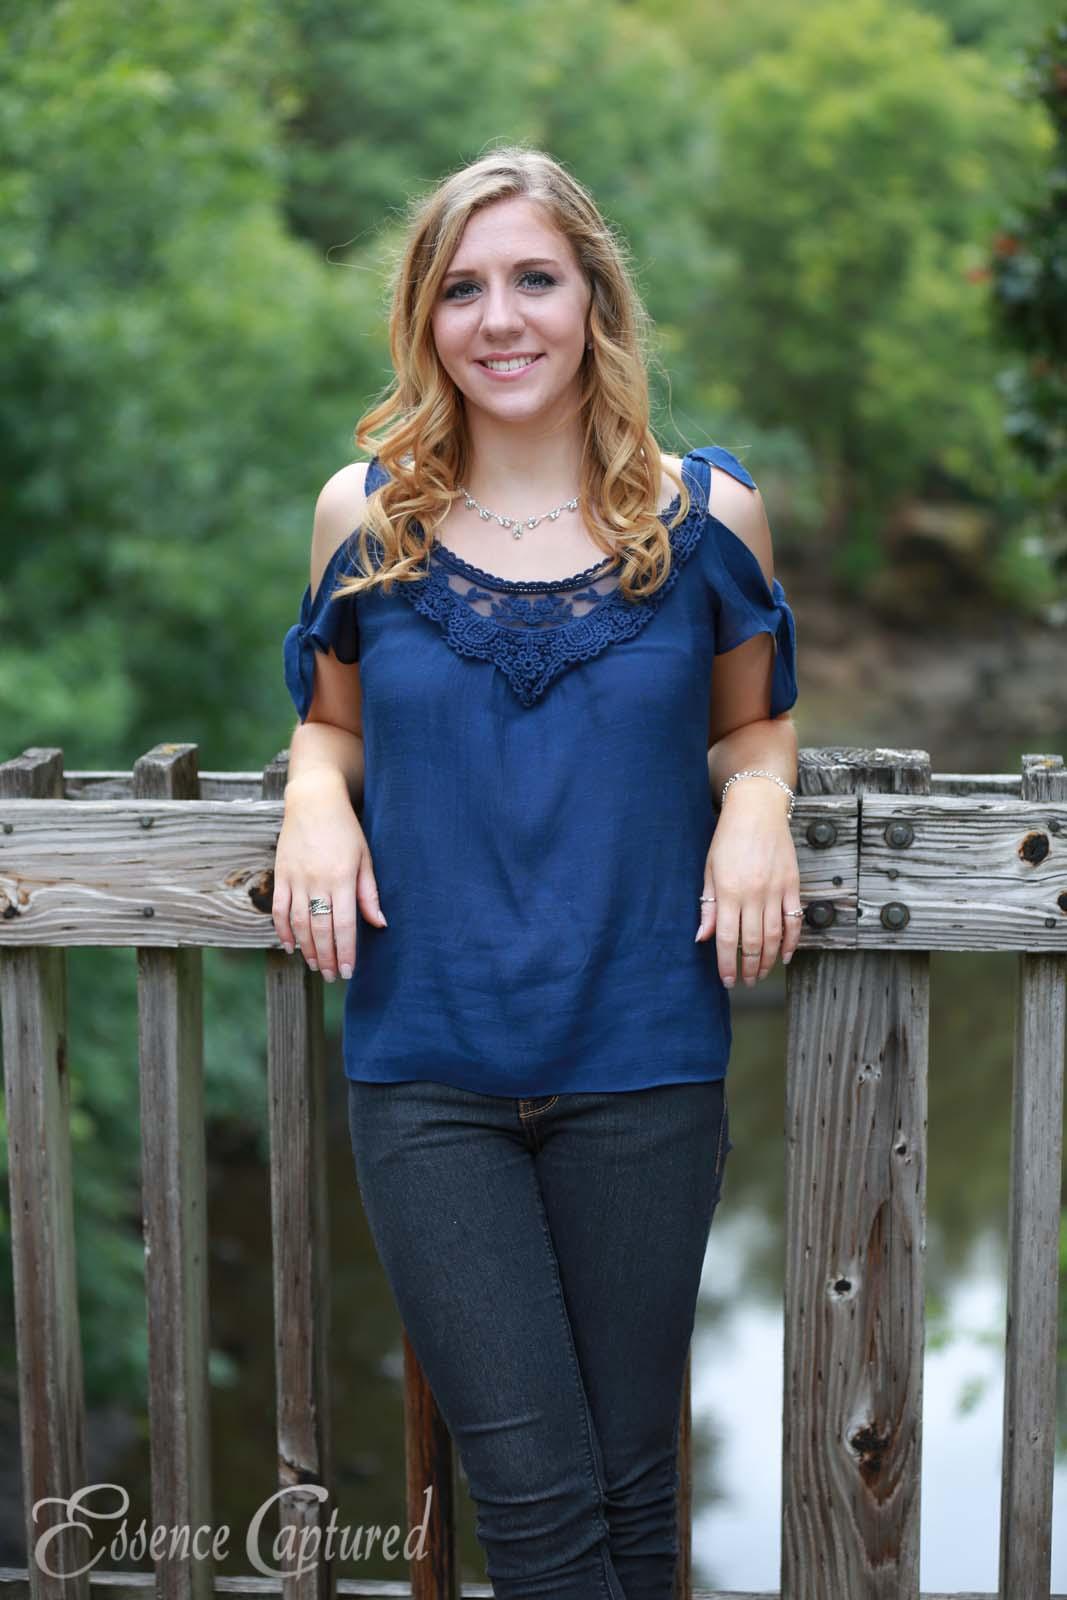 female high school senior portrait blue top long blonde hair standing on bridge over river